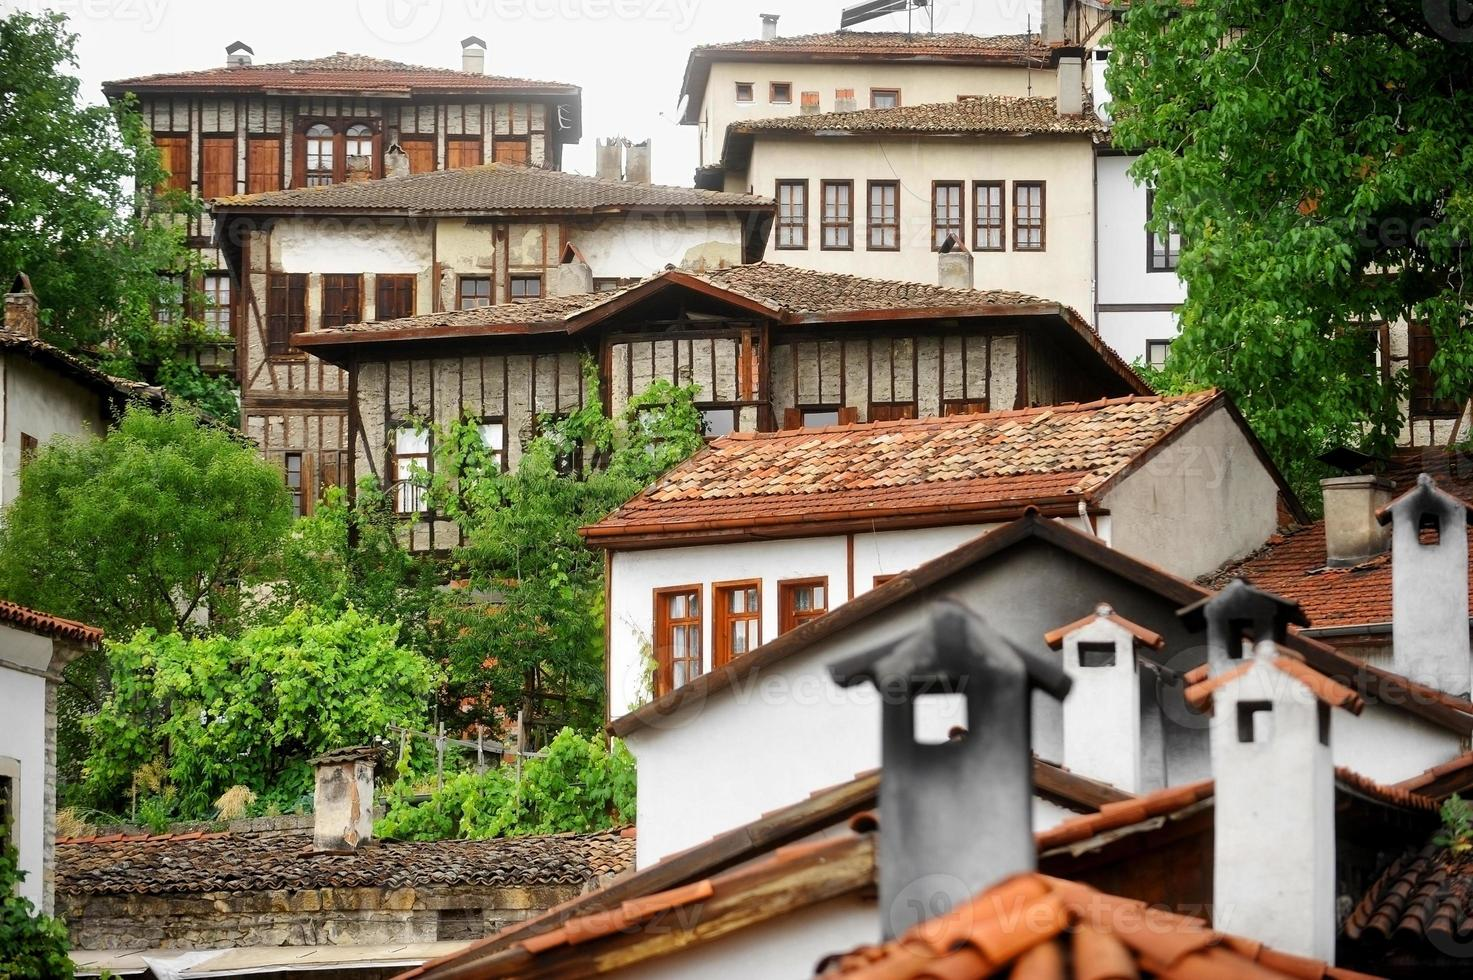 safranbolu ottomane maisons anciennes photo